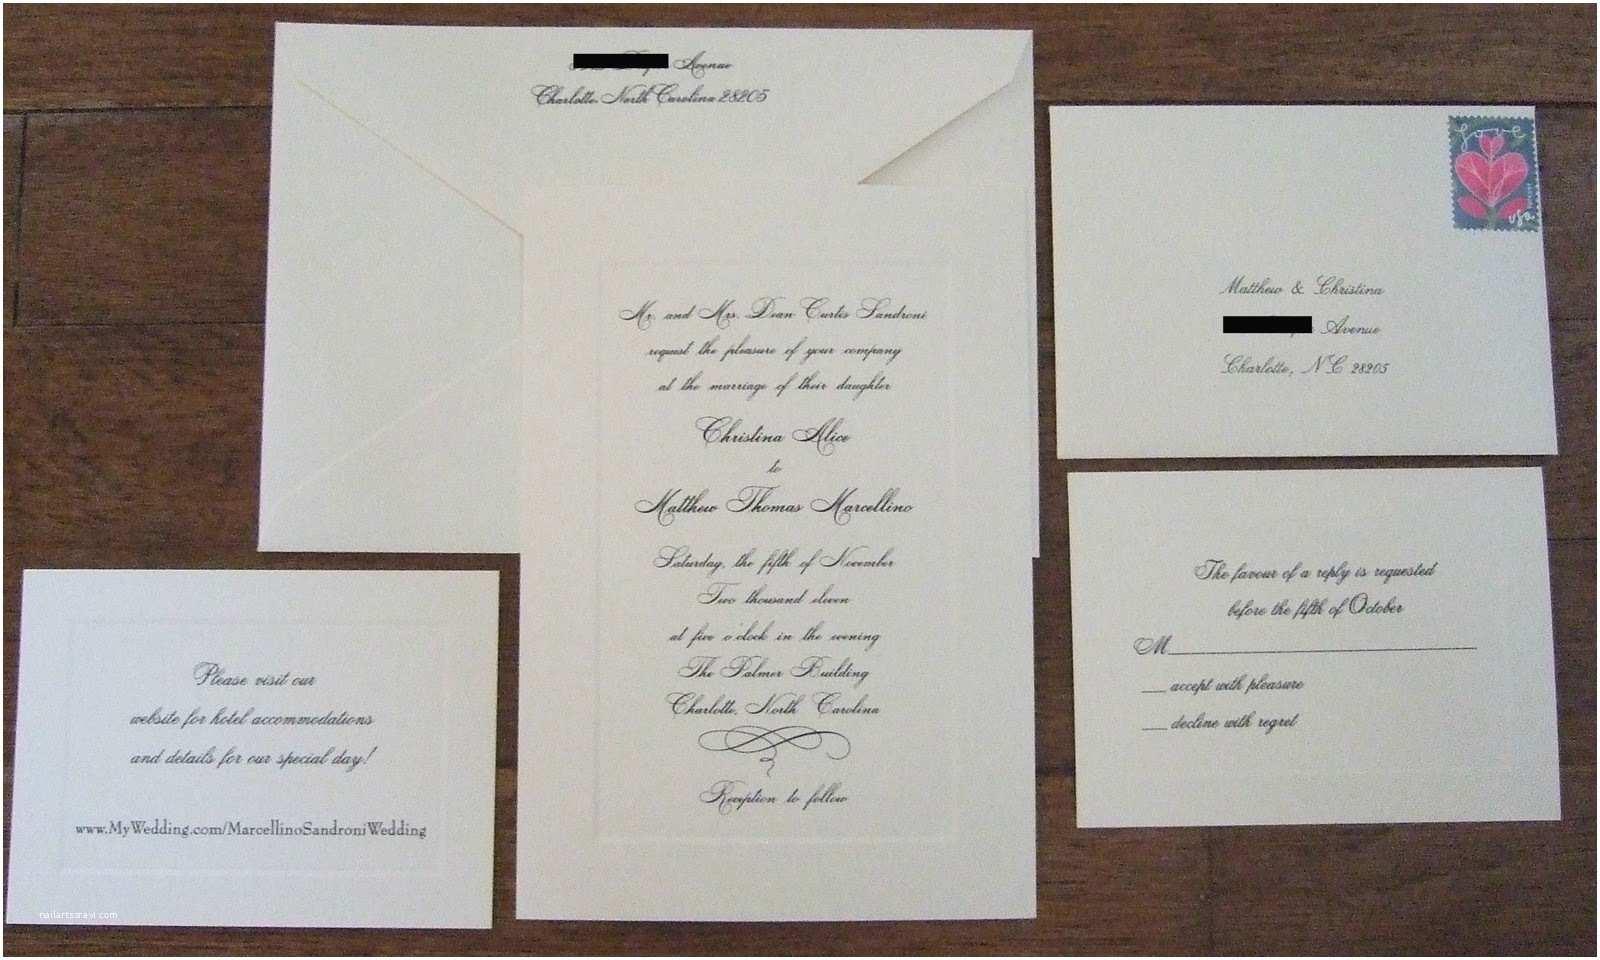 Sending Wedding Invitations Wonderful Sending Wedding Invitations which is Currently A